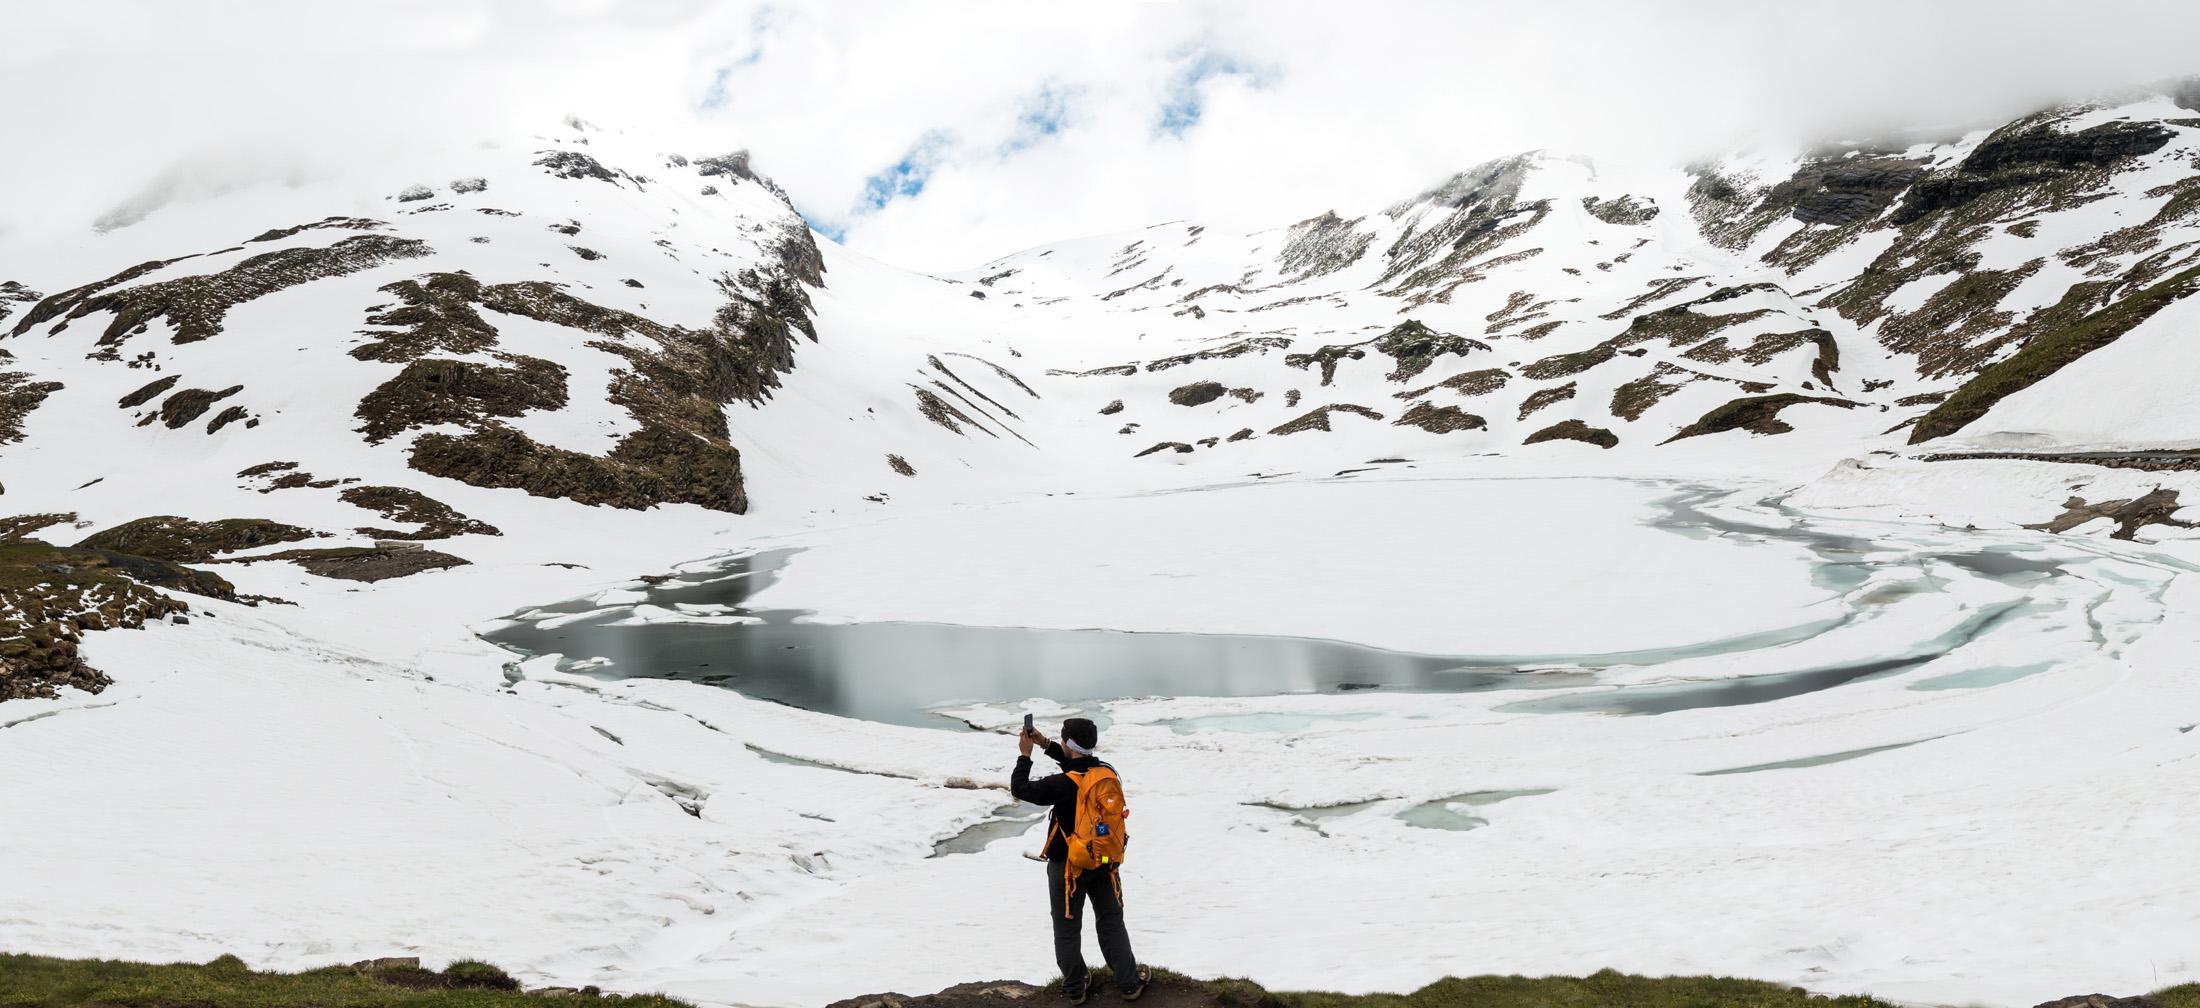 Jezior Bachalpsee lake